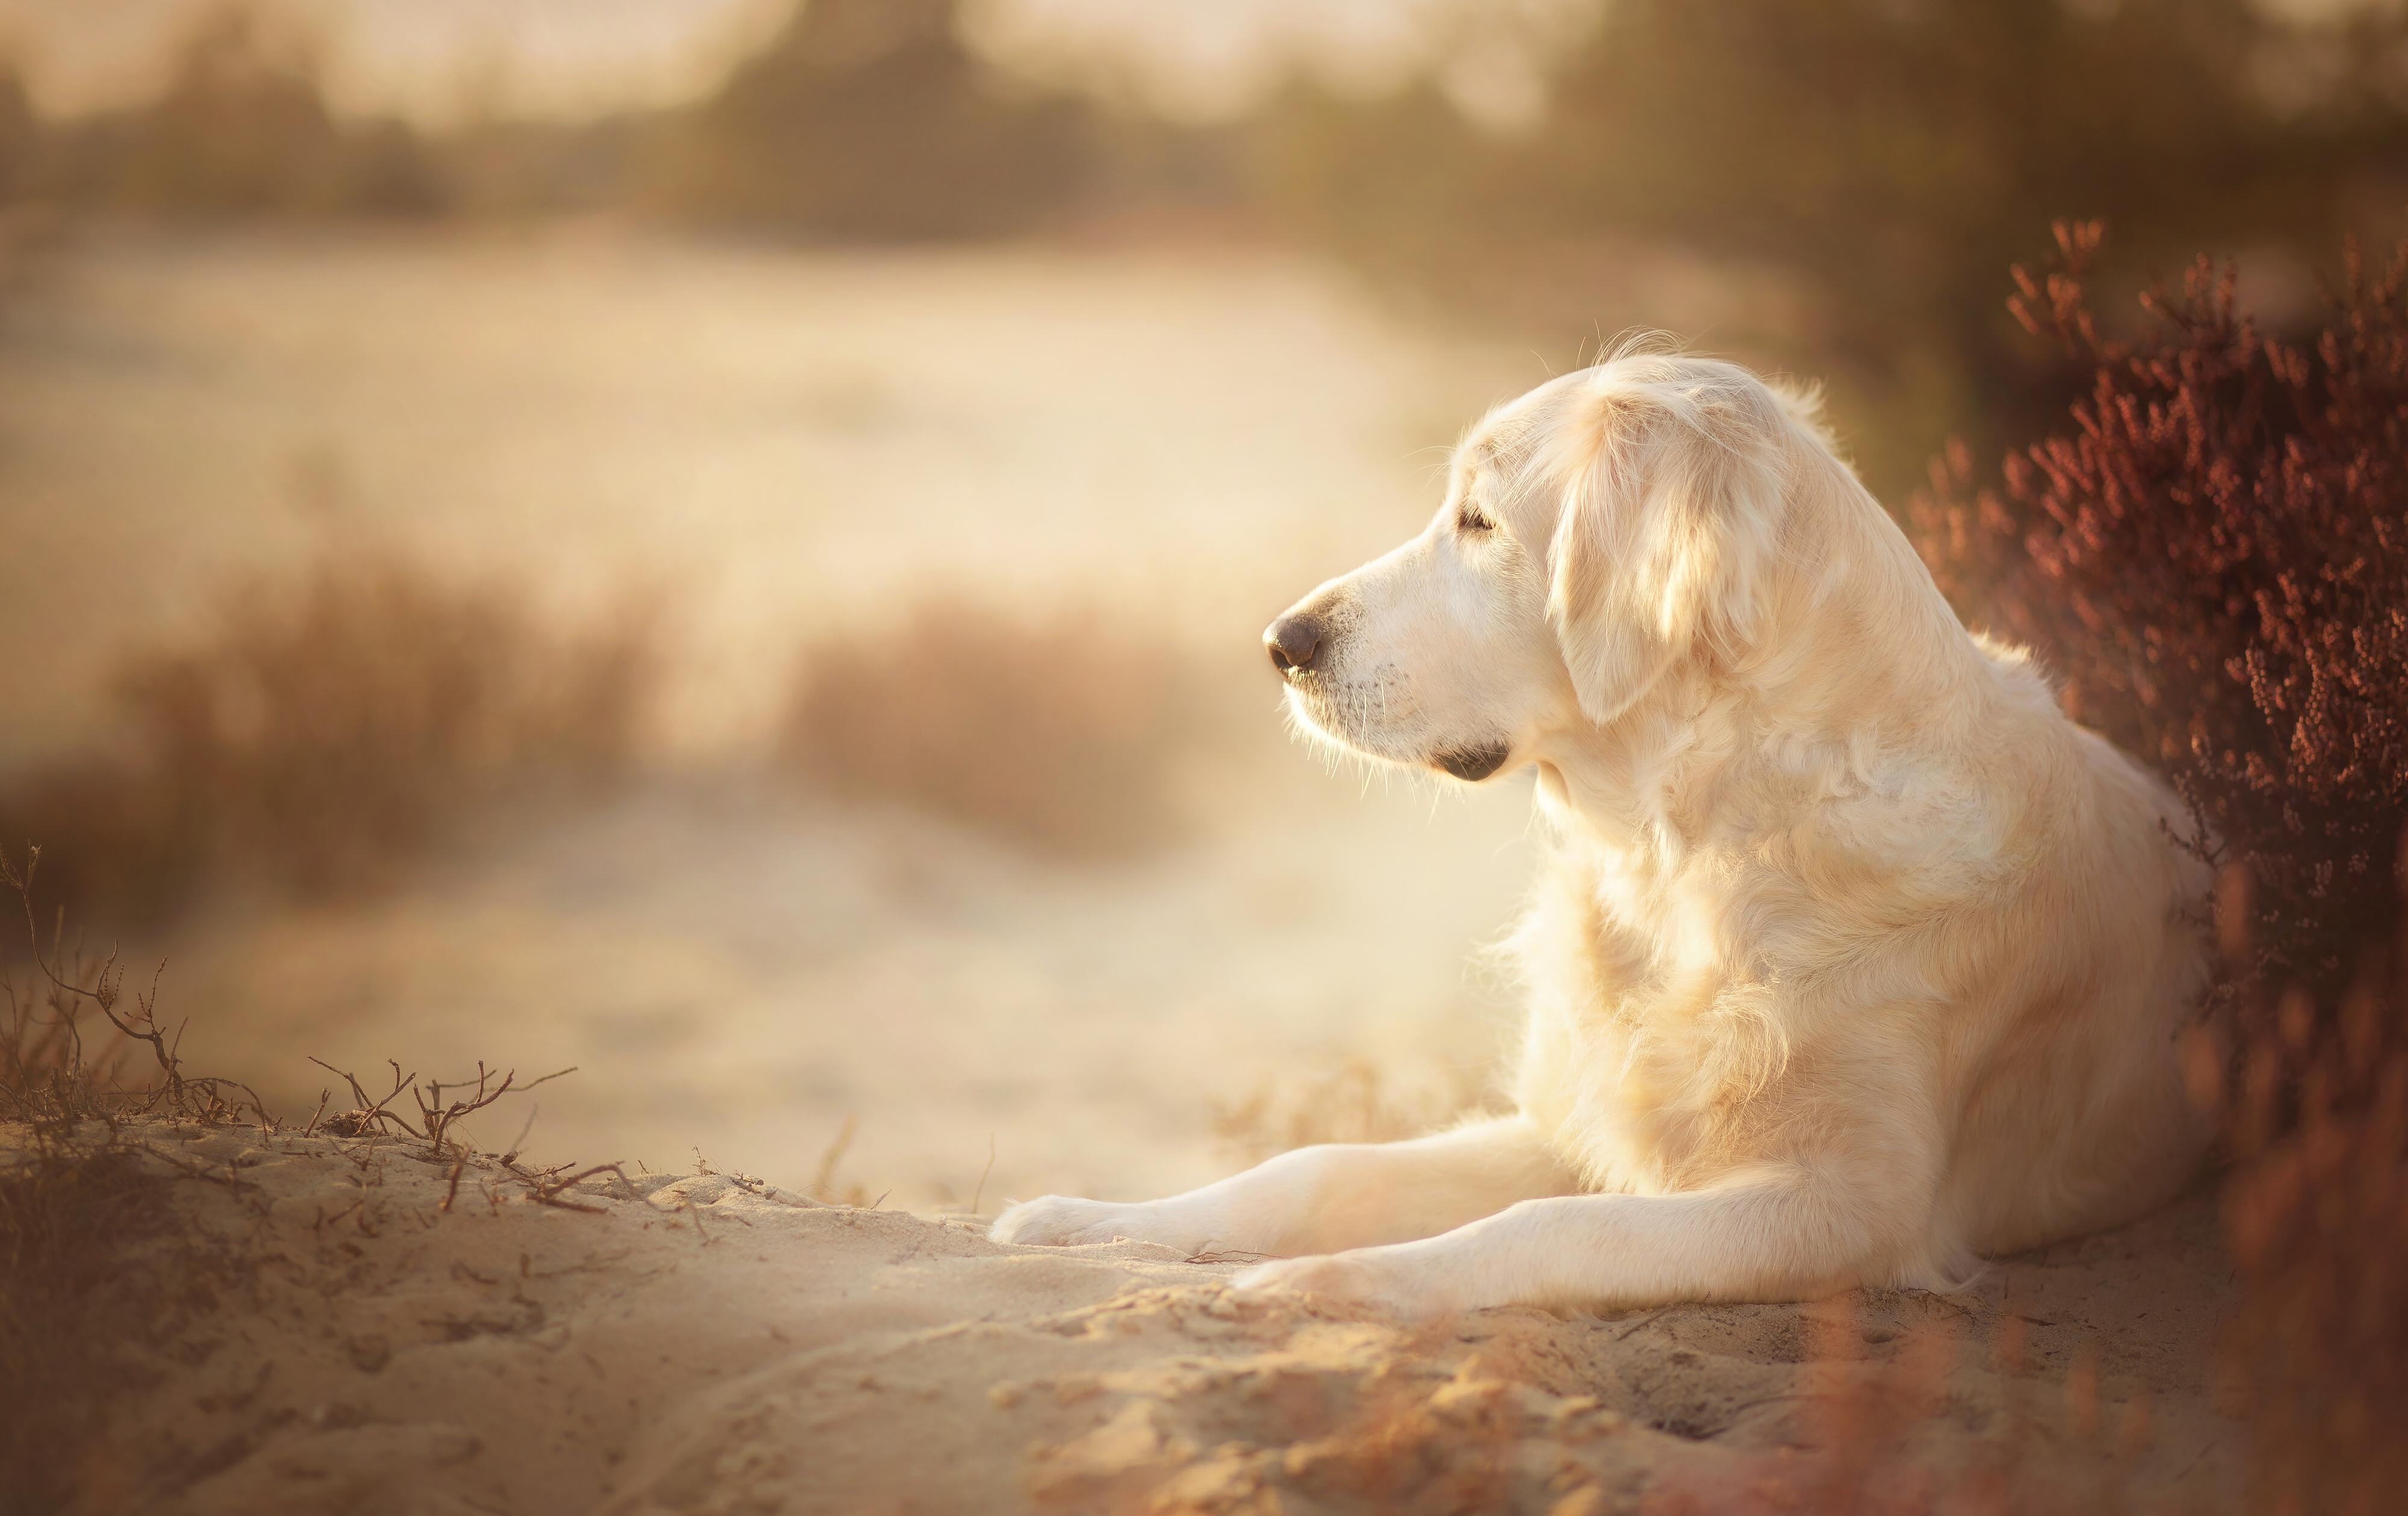 собака песок вода животное природа  № 956885 бесплатно